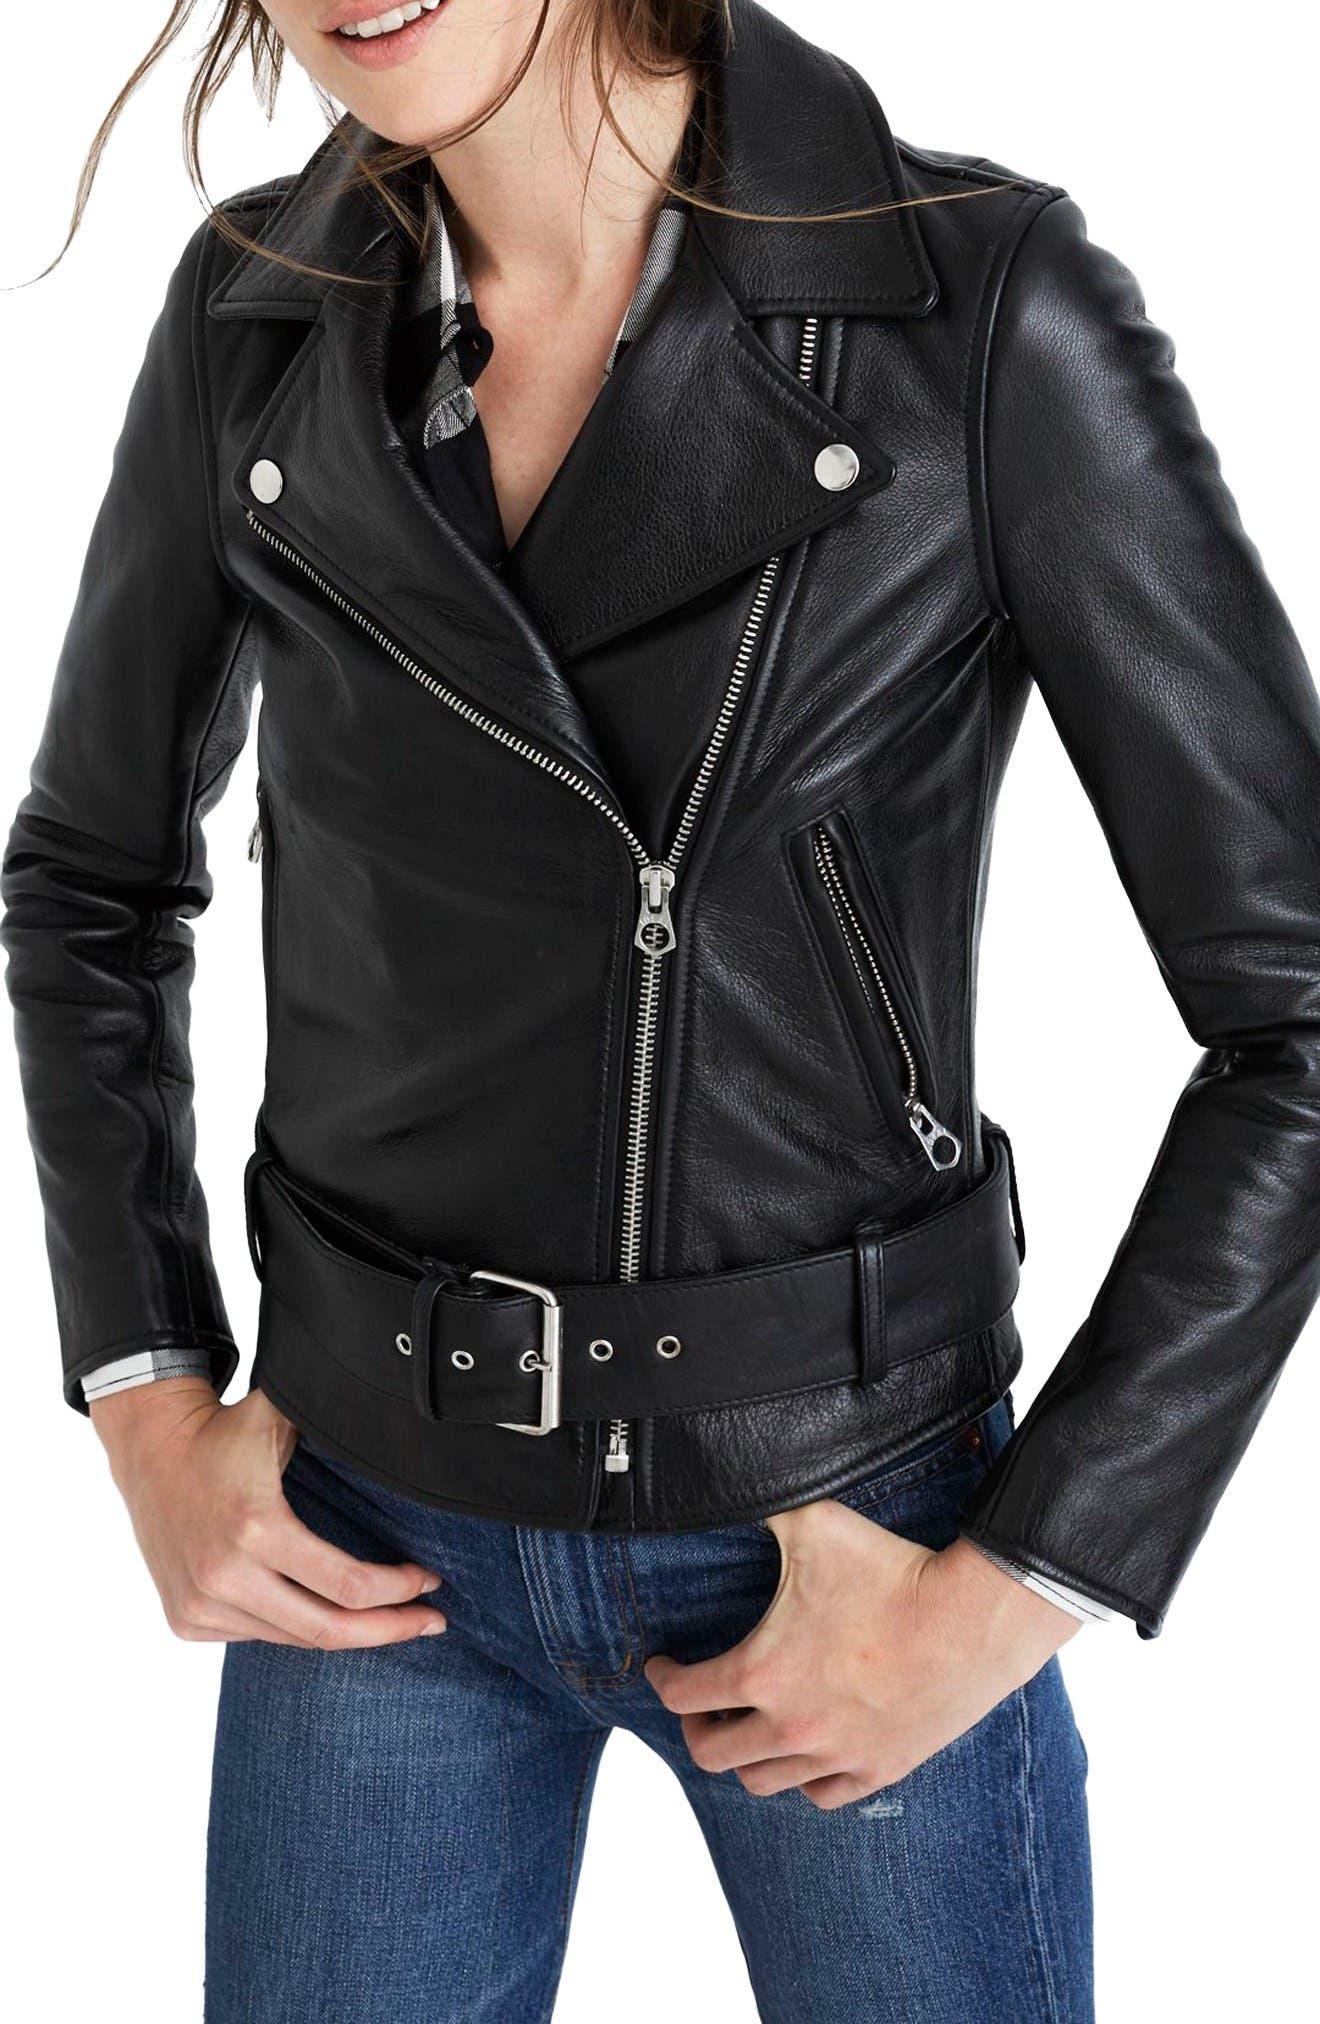 Main Image - Madewell Ultimate Leather Jacket